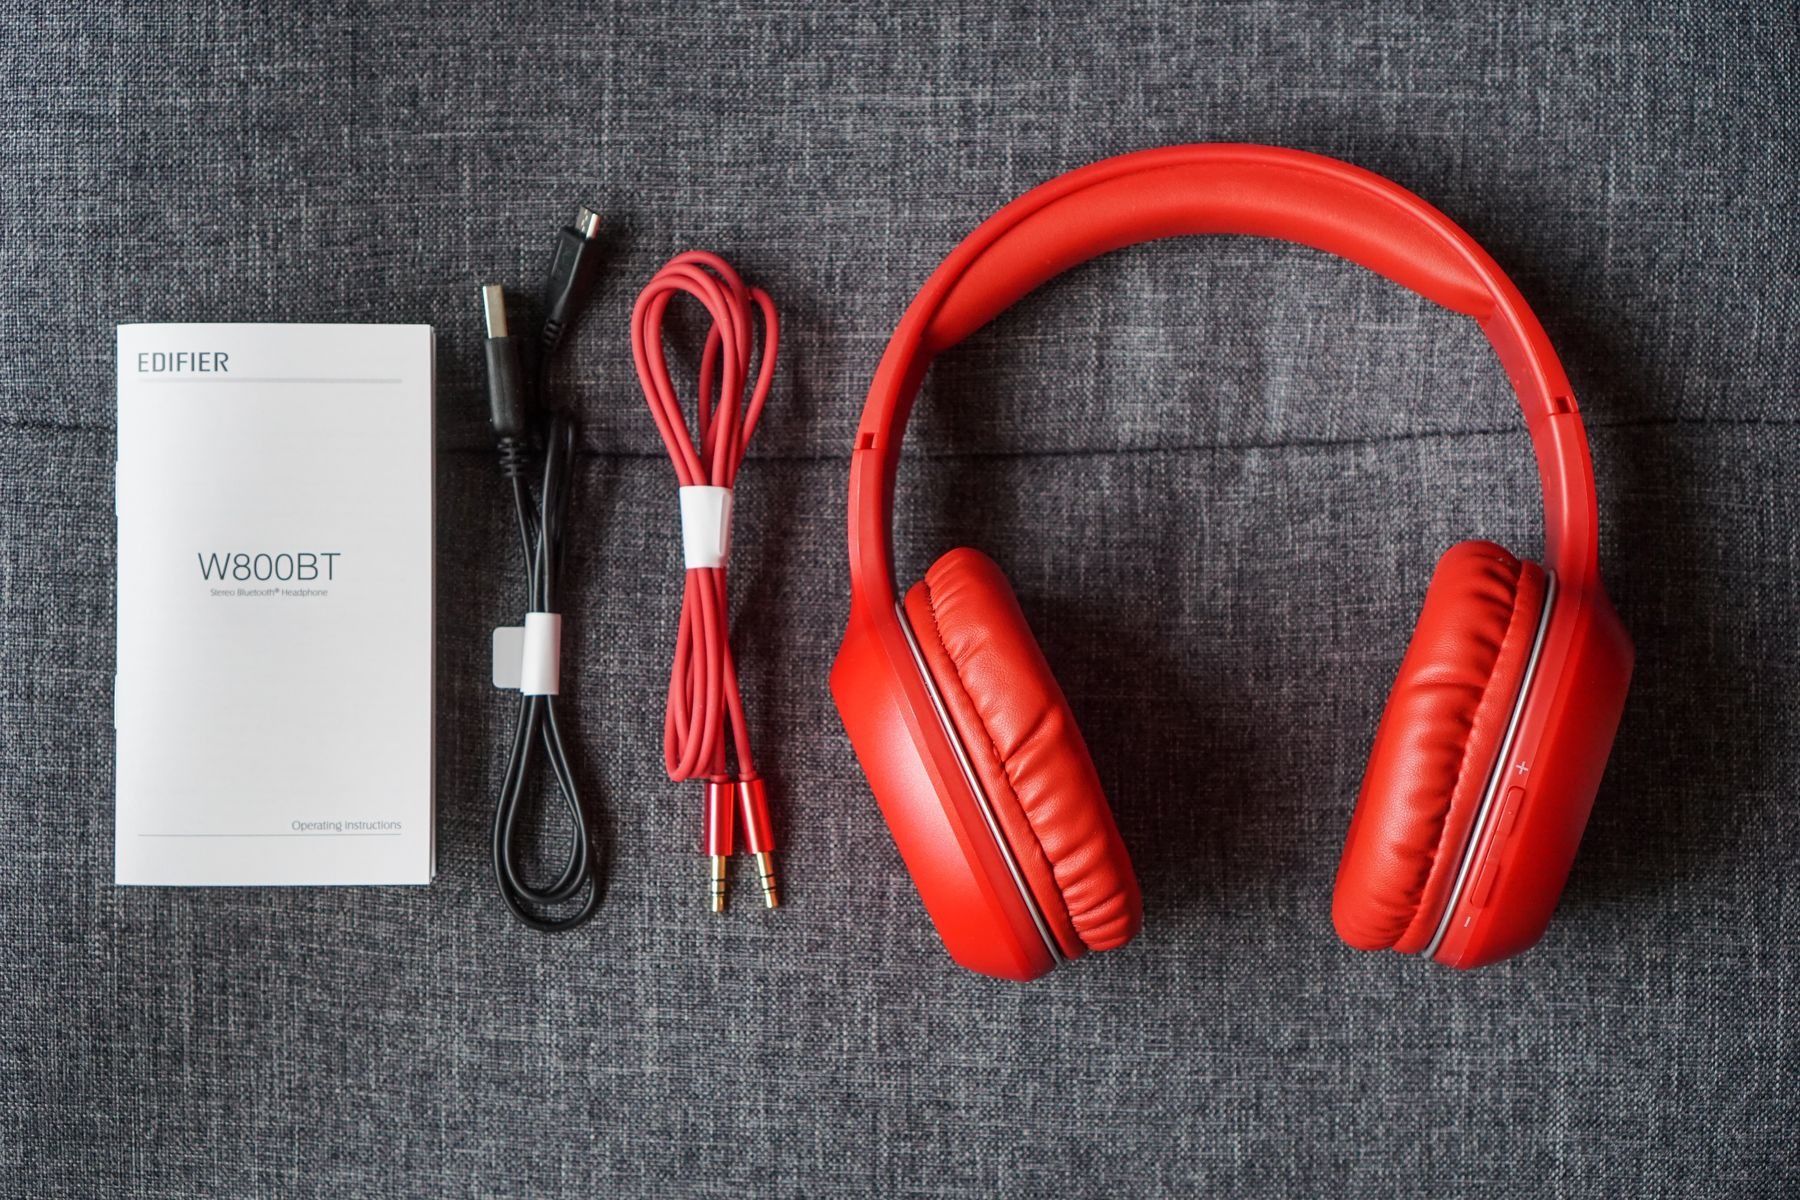 Edifier W800BT Headphones Review | The Headphone List